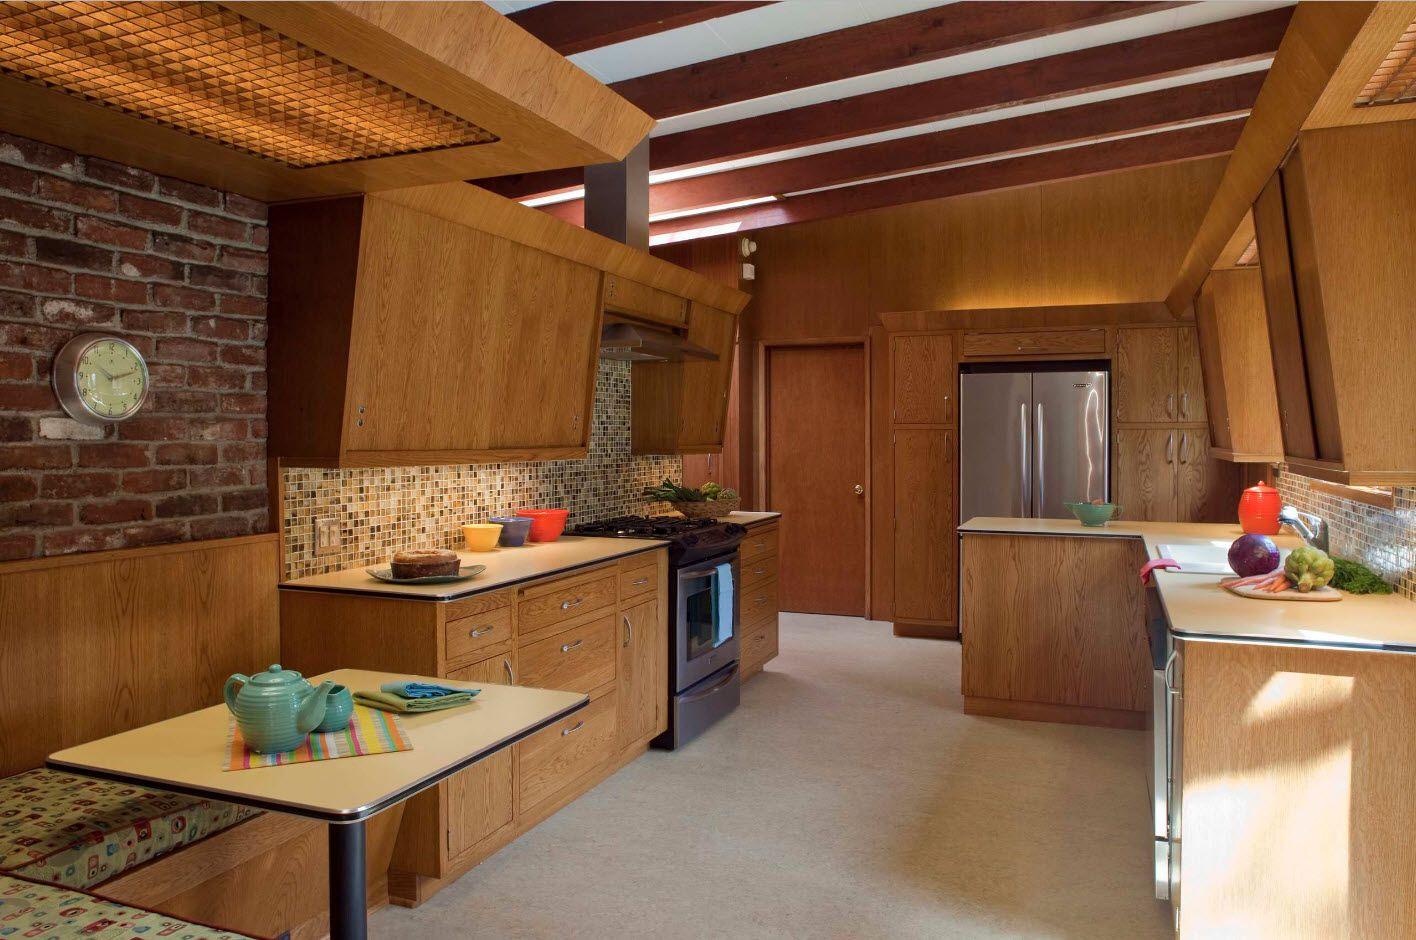 Кухня с мягким уголком